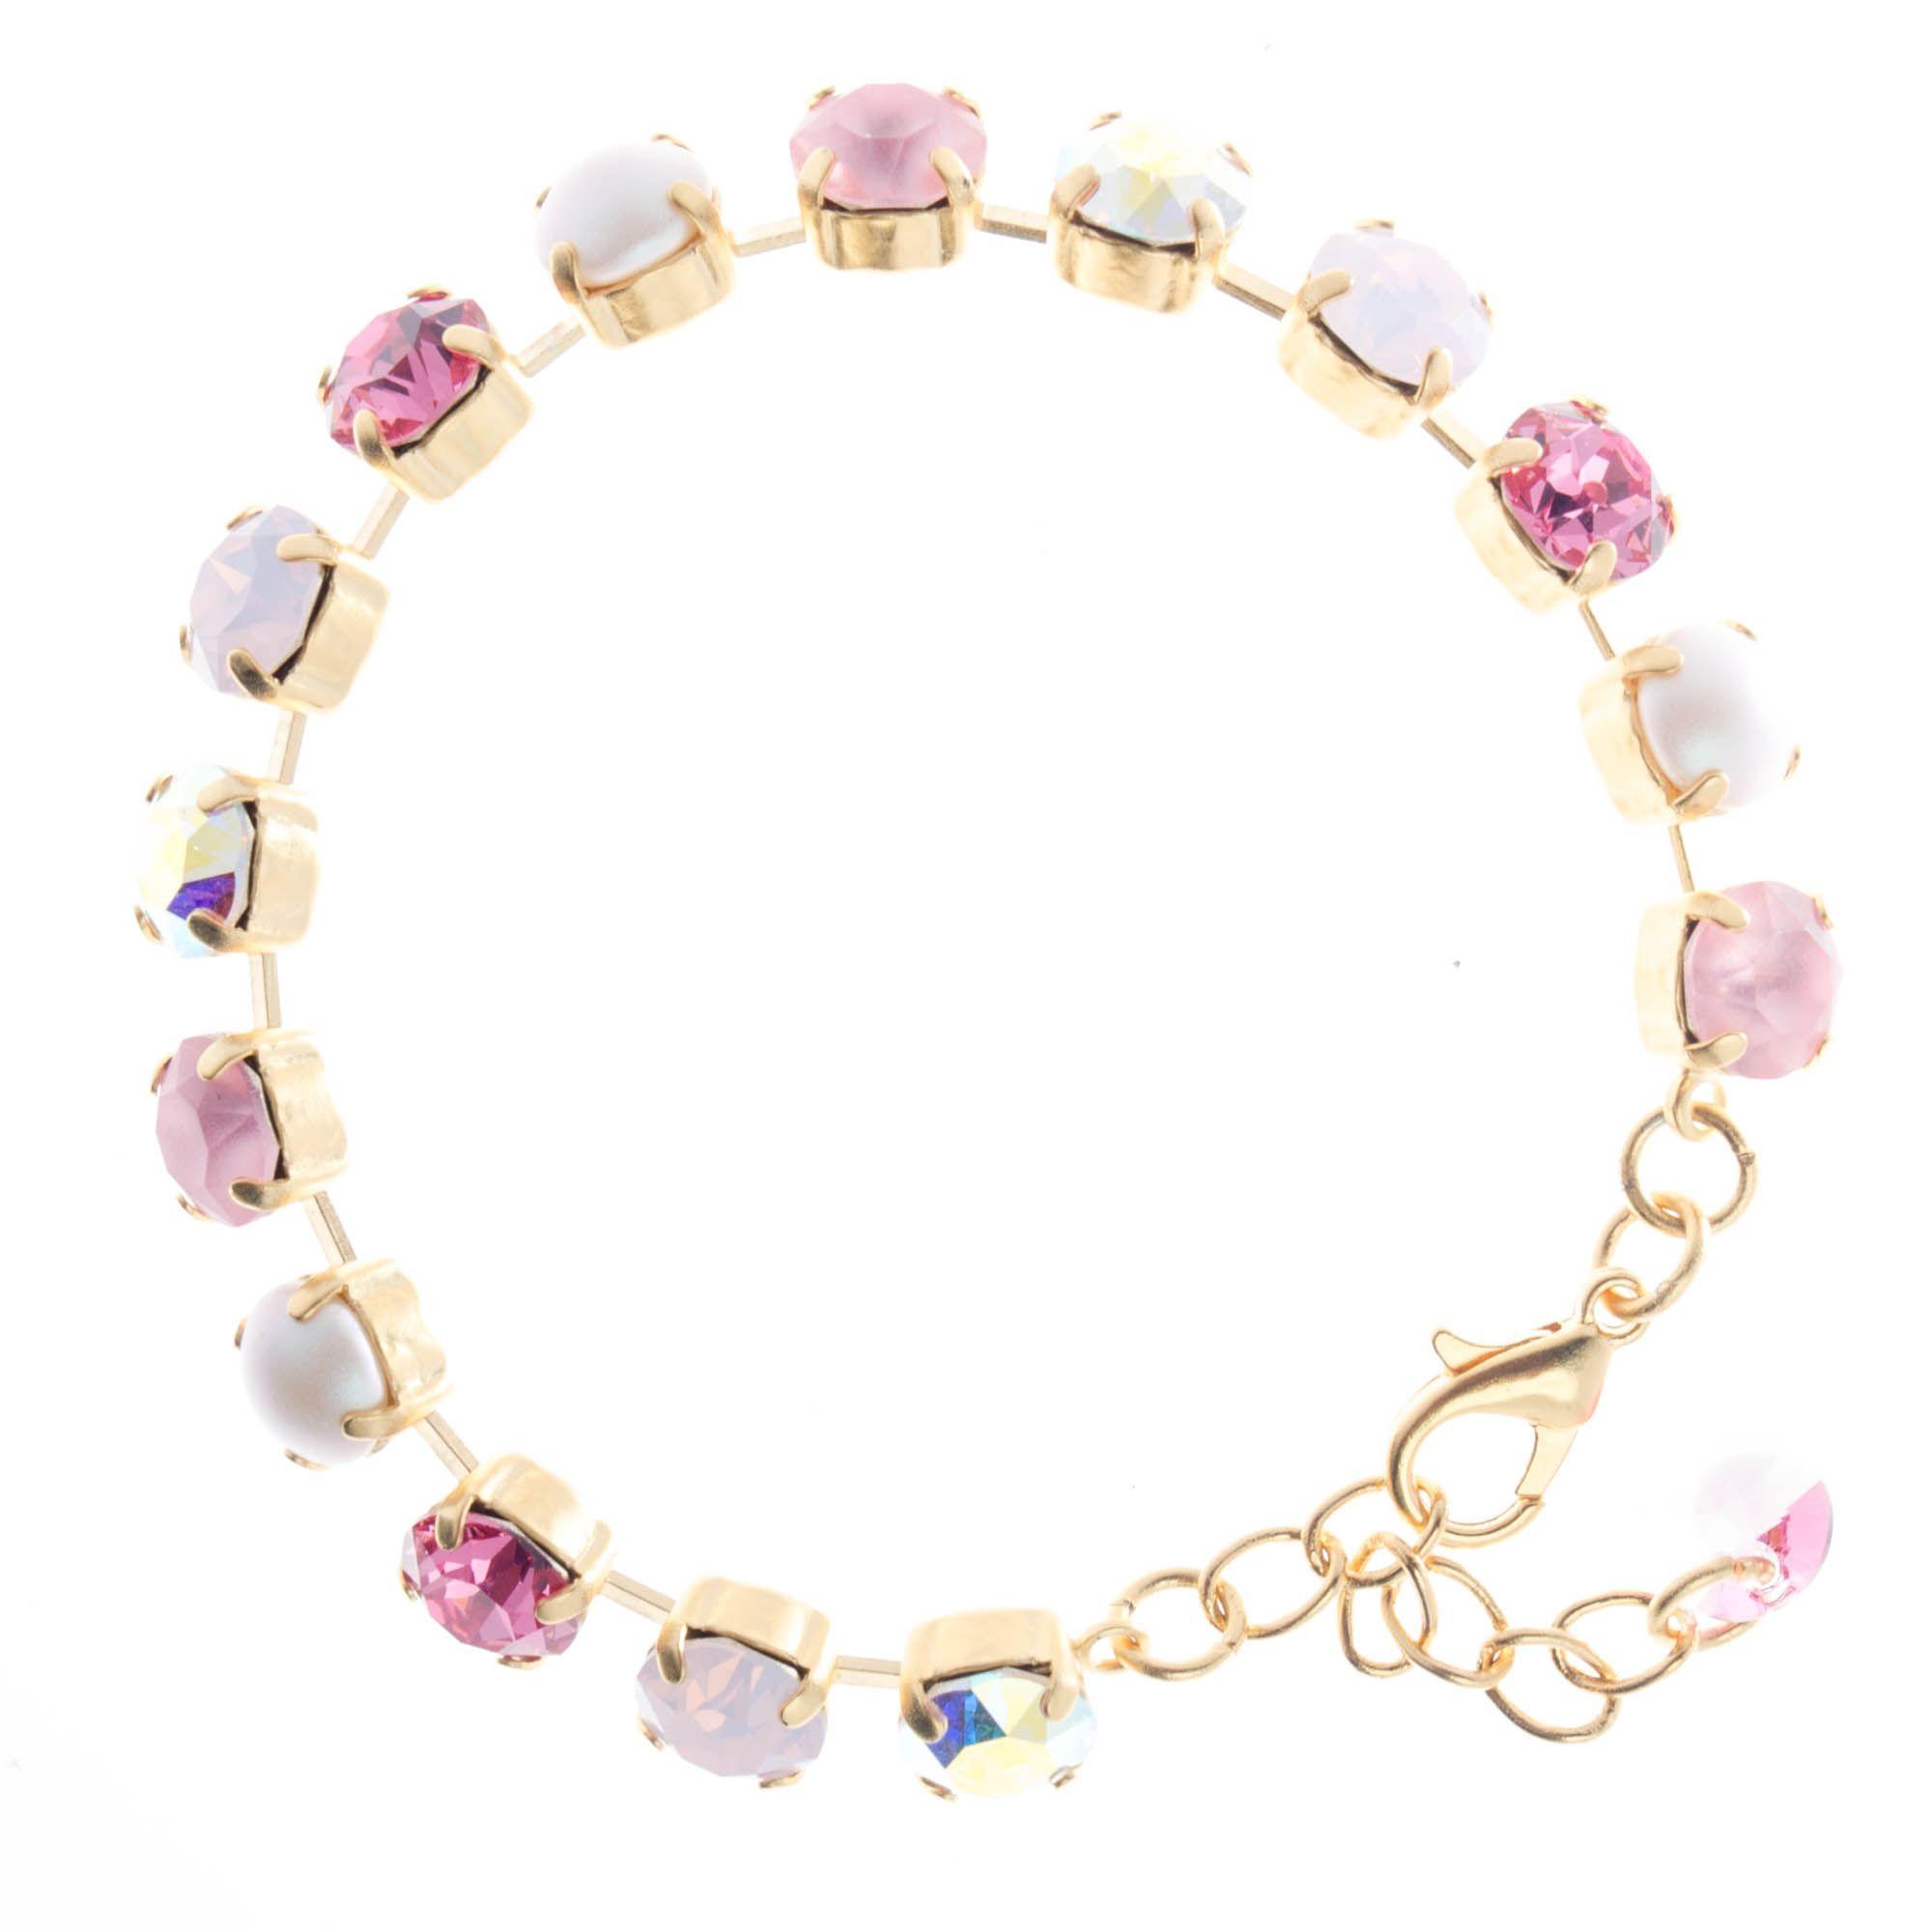 Ypmco 8mm Swarovski Crystal Tennis Bracelet Pink Pearl Combo